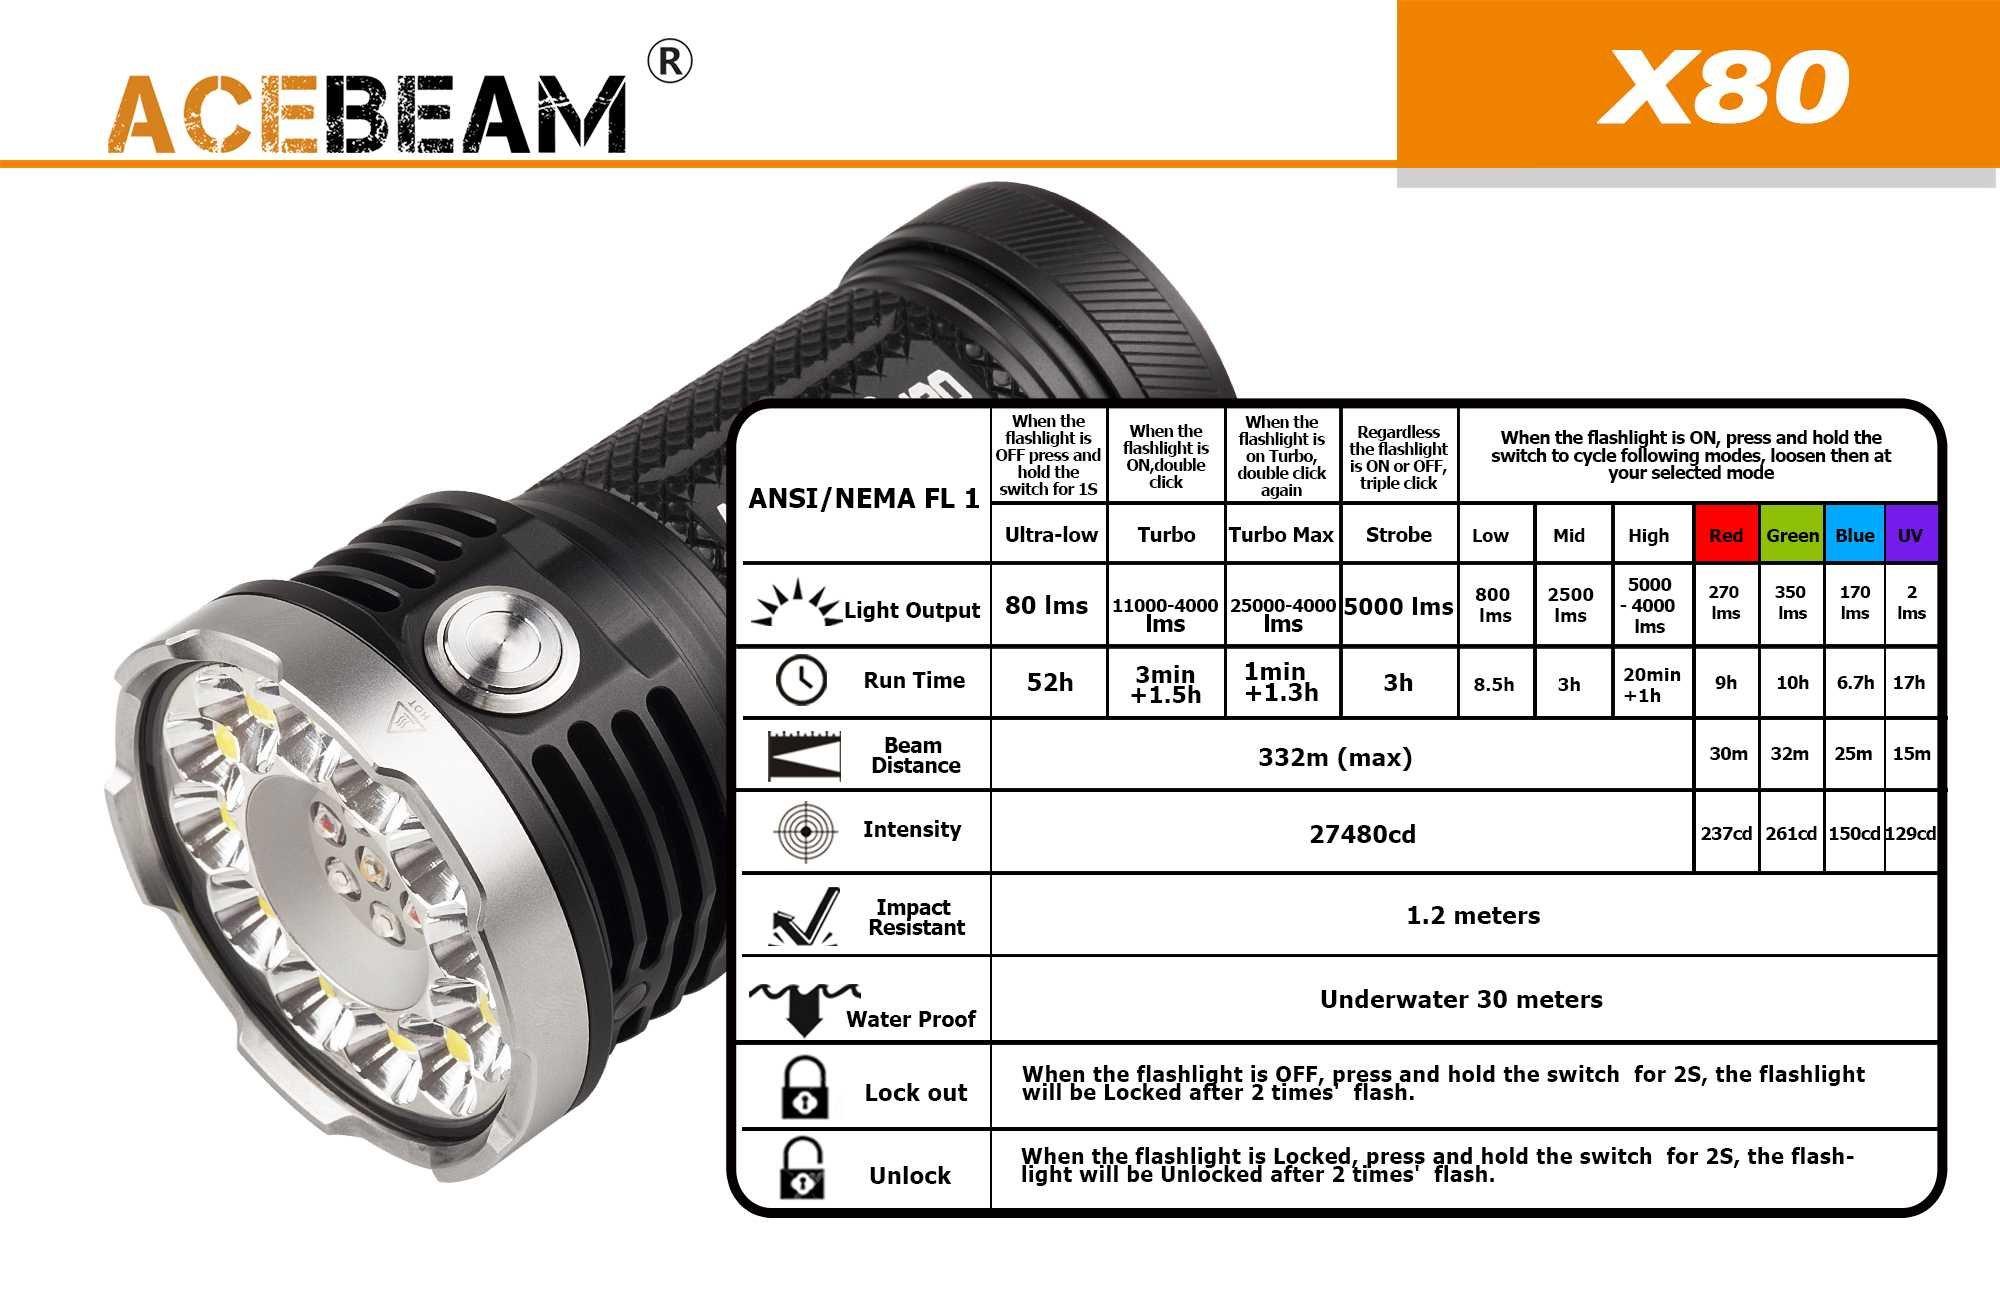 ACEBEAM X80 LED Flashlight 12x Cree XHP50.2 25000 Lumens 5-color Light Beam Flashlights Included 4 3100mah Batteries by Acebeam (Image #8)